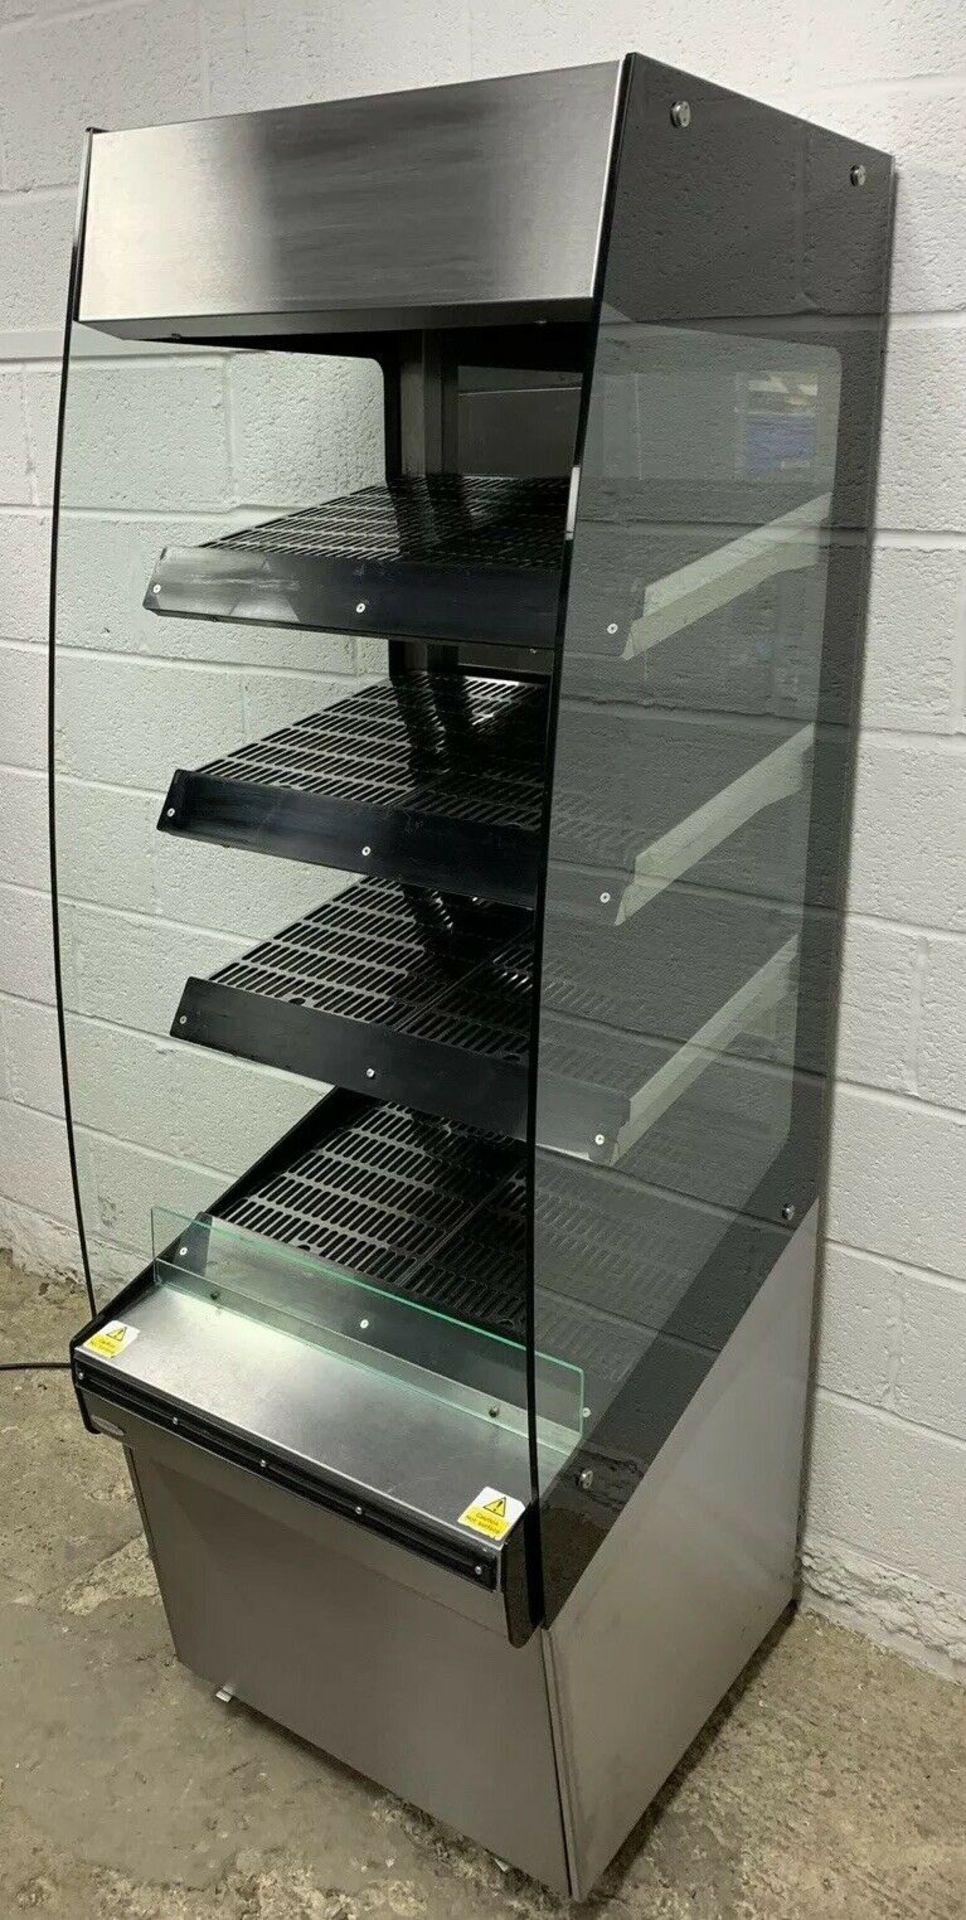 Lot 41 - Counterline EFH600 Hot Food Display Unit